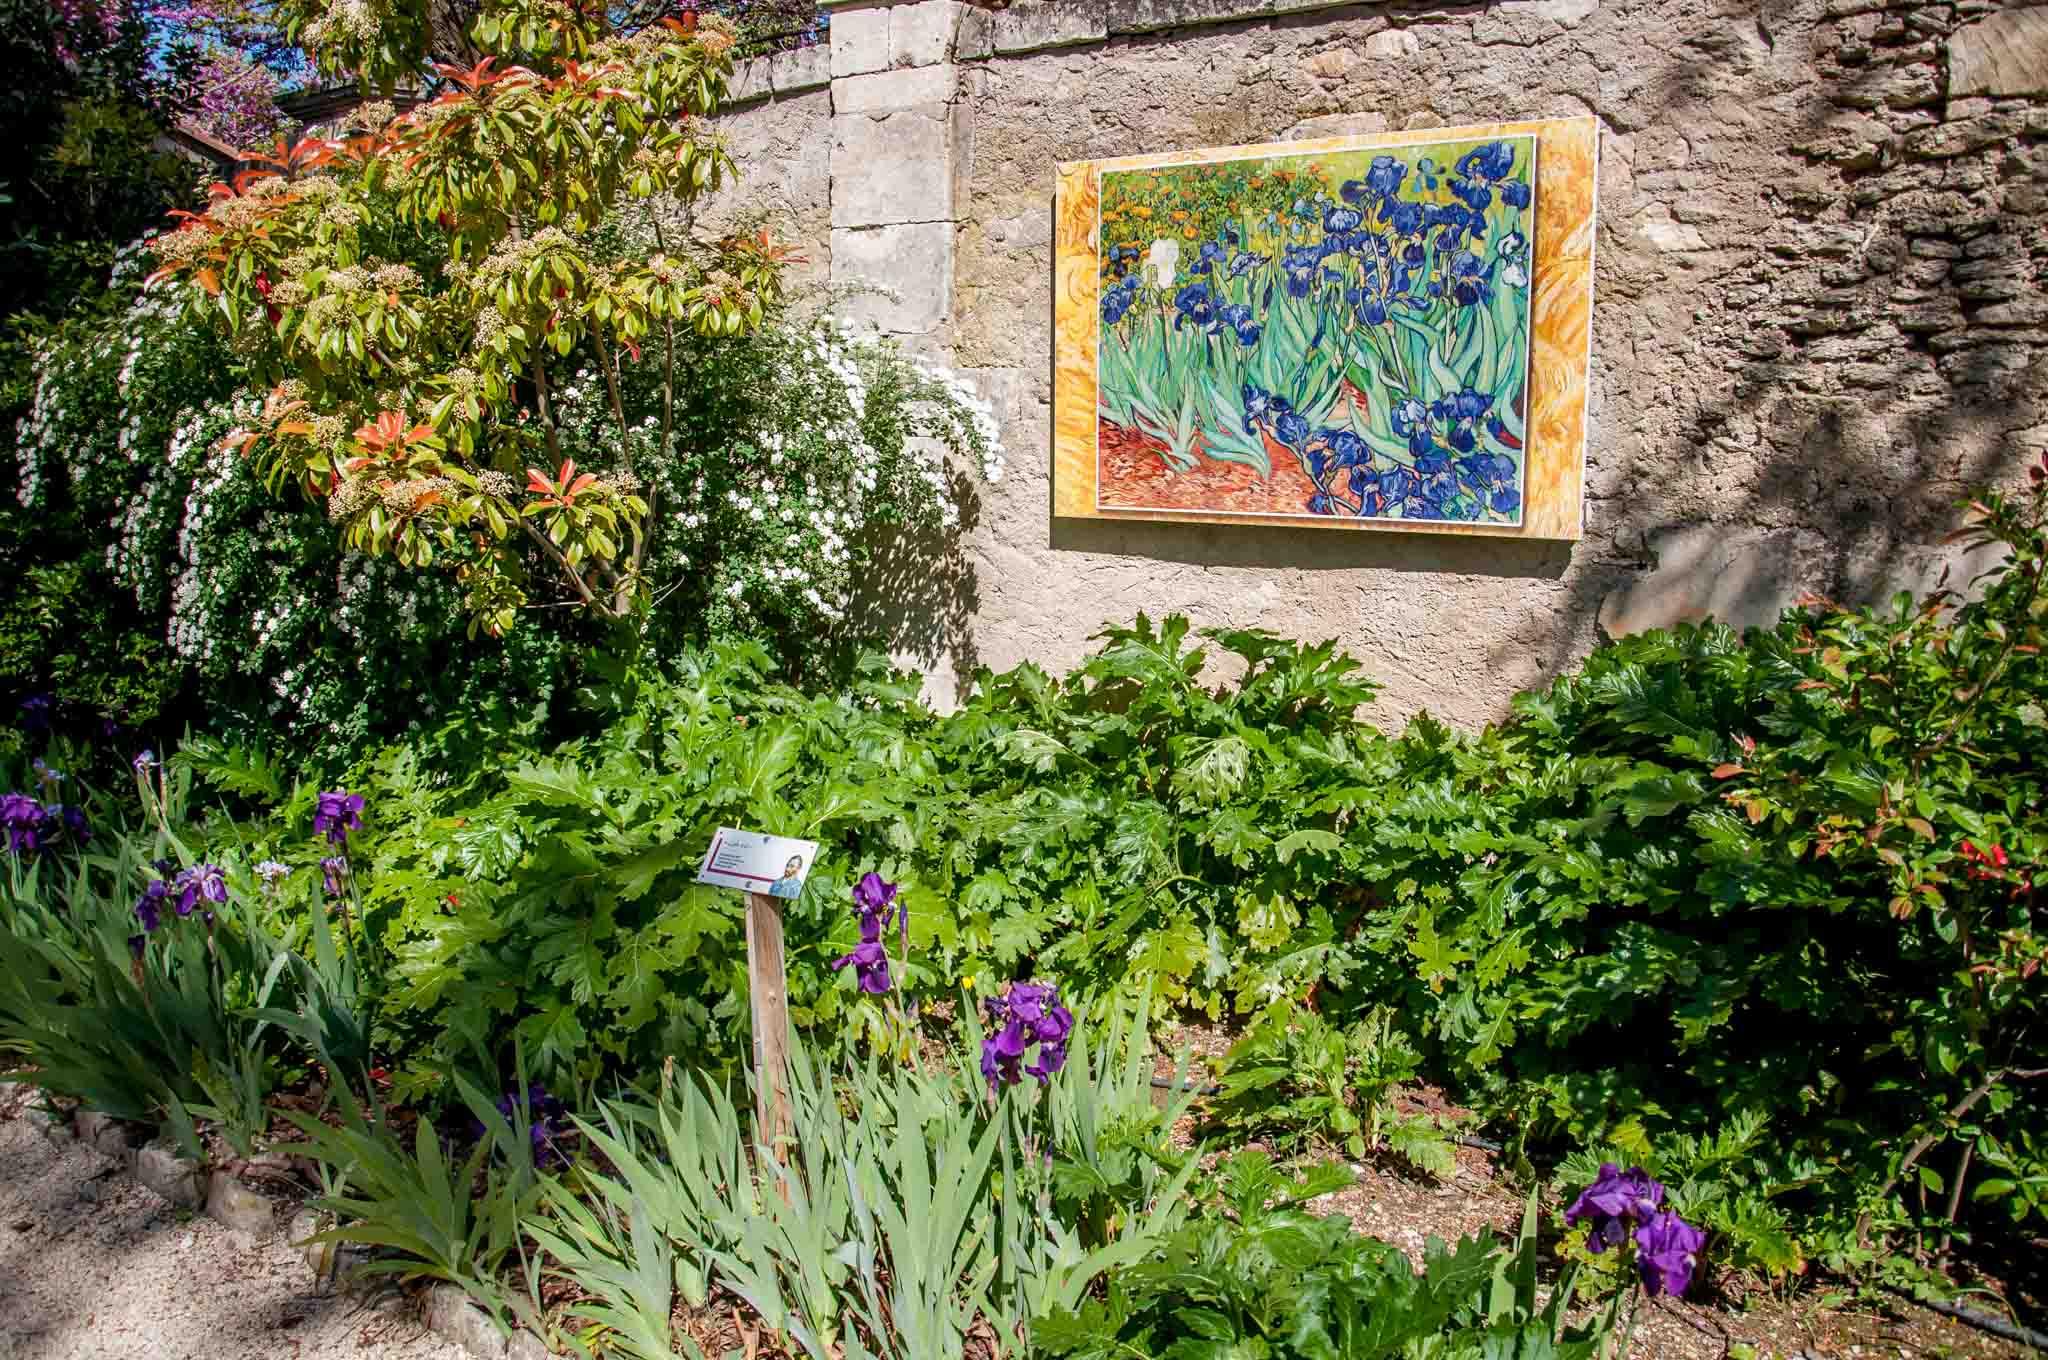 Replicas of Van Gogh's painting of flowers set among flowers